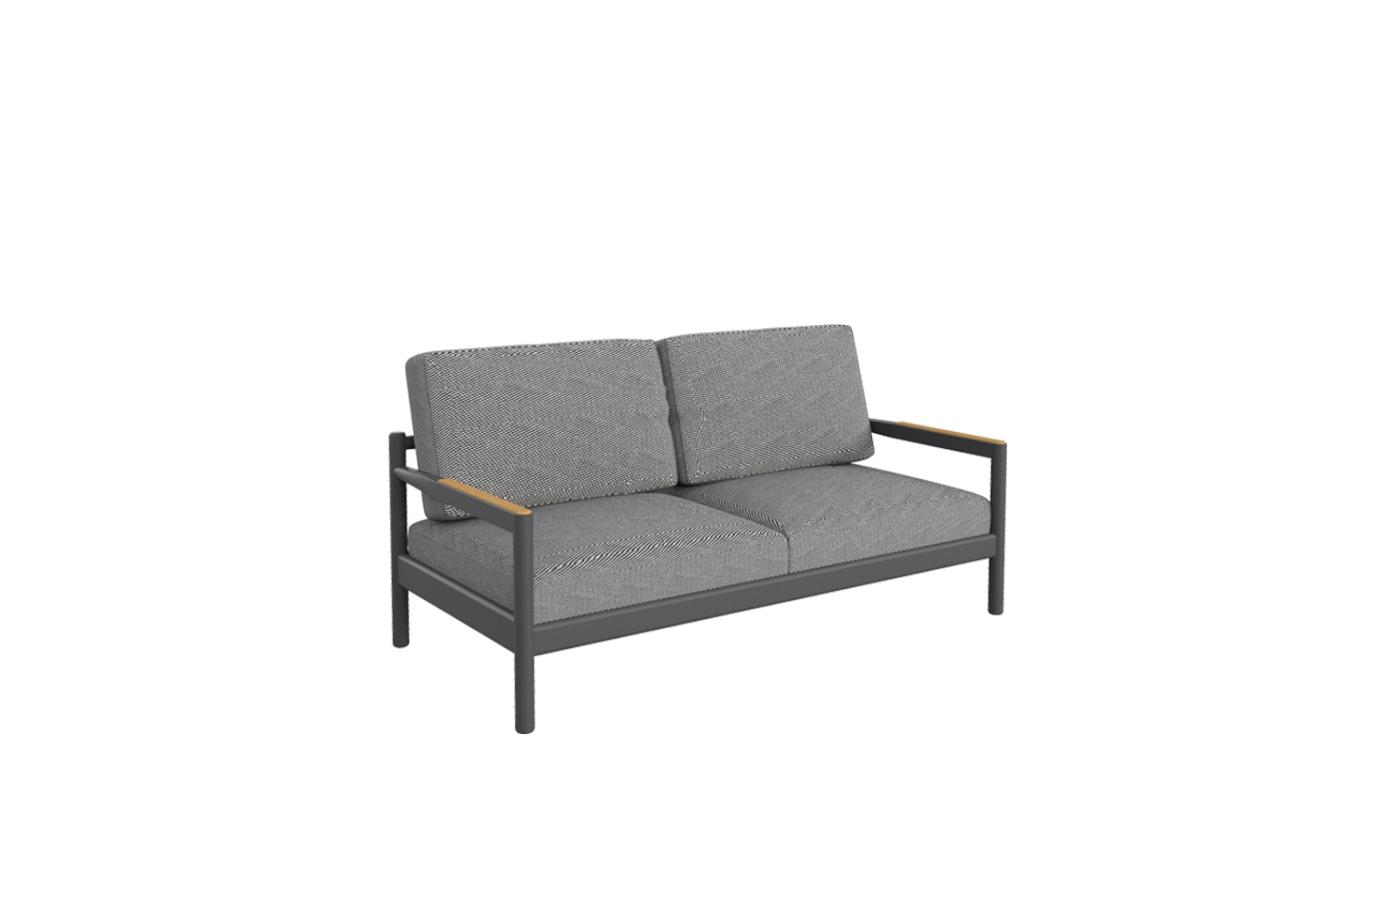 Constania 2-Seater Sofa